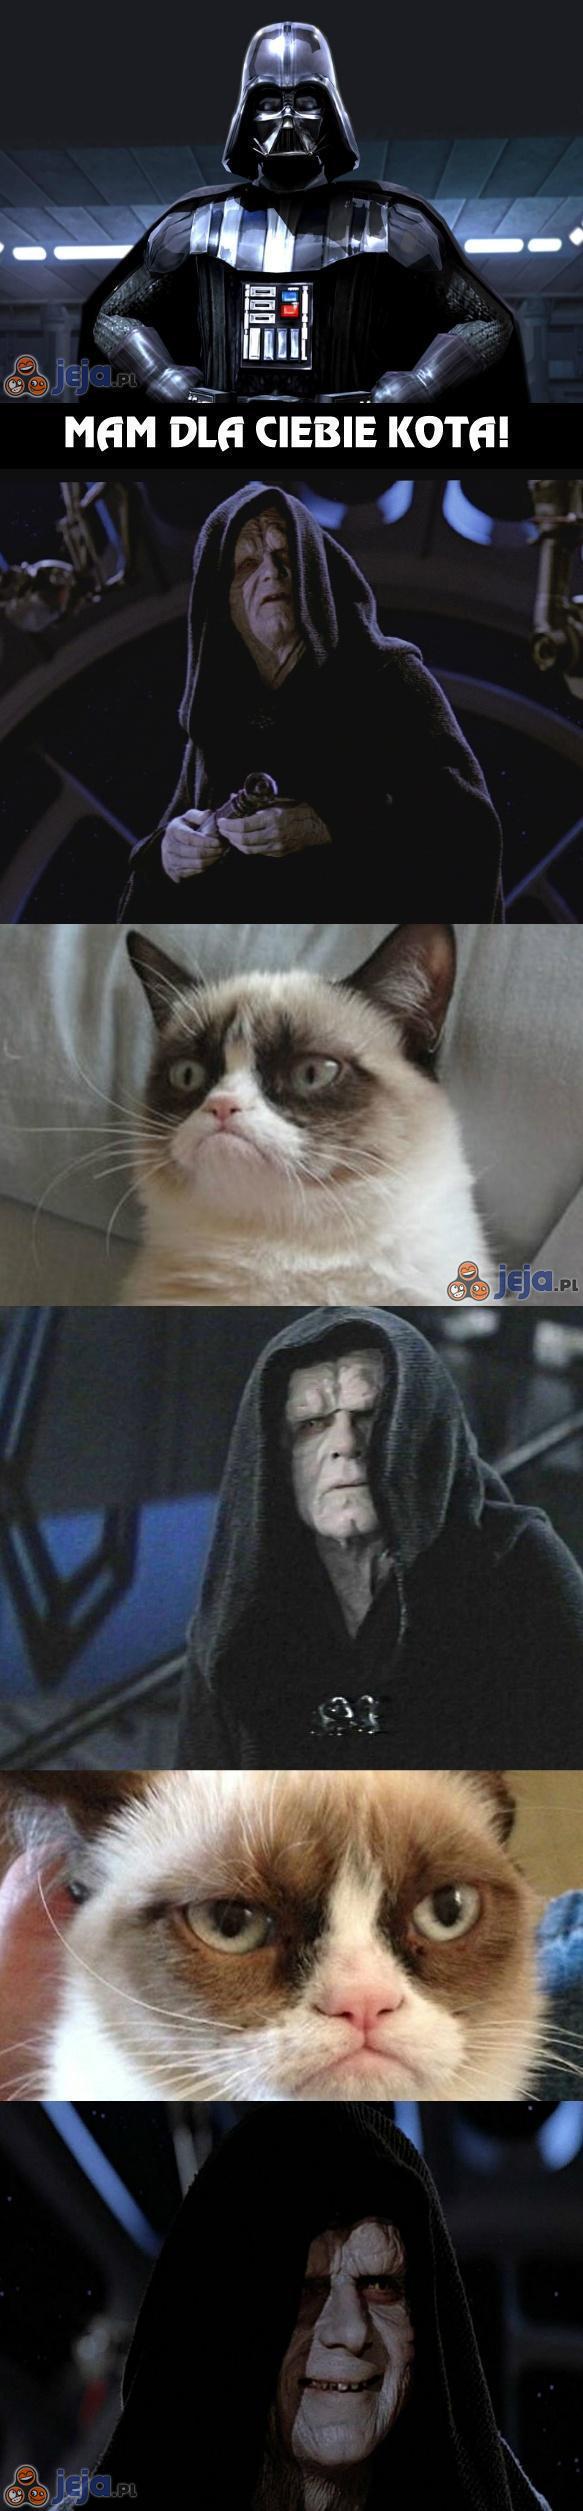 Kot dla Dark Sidiousa